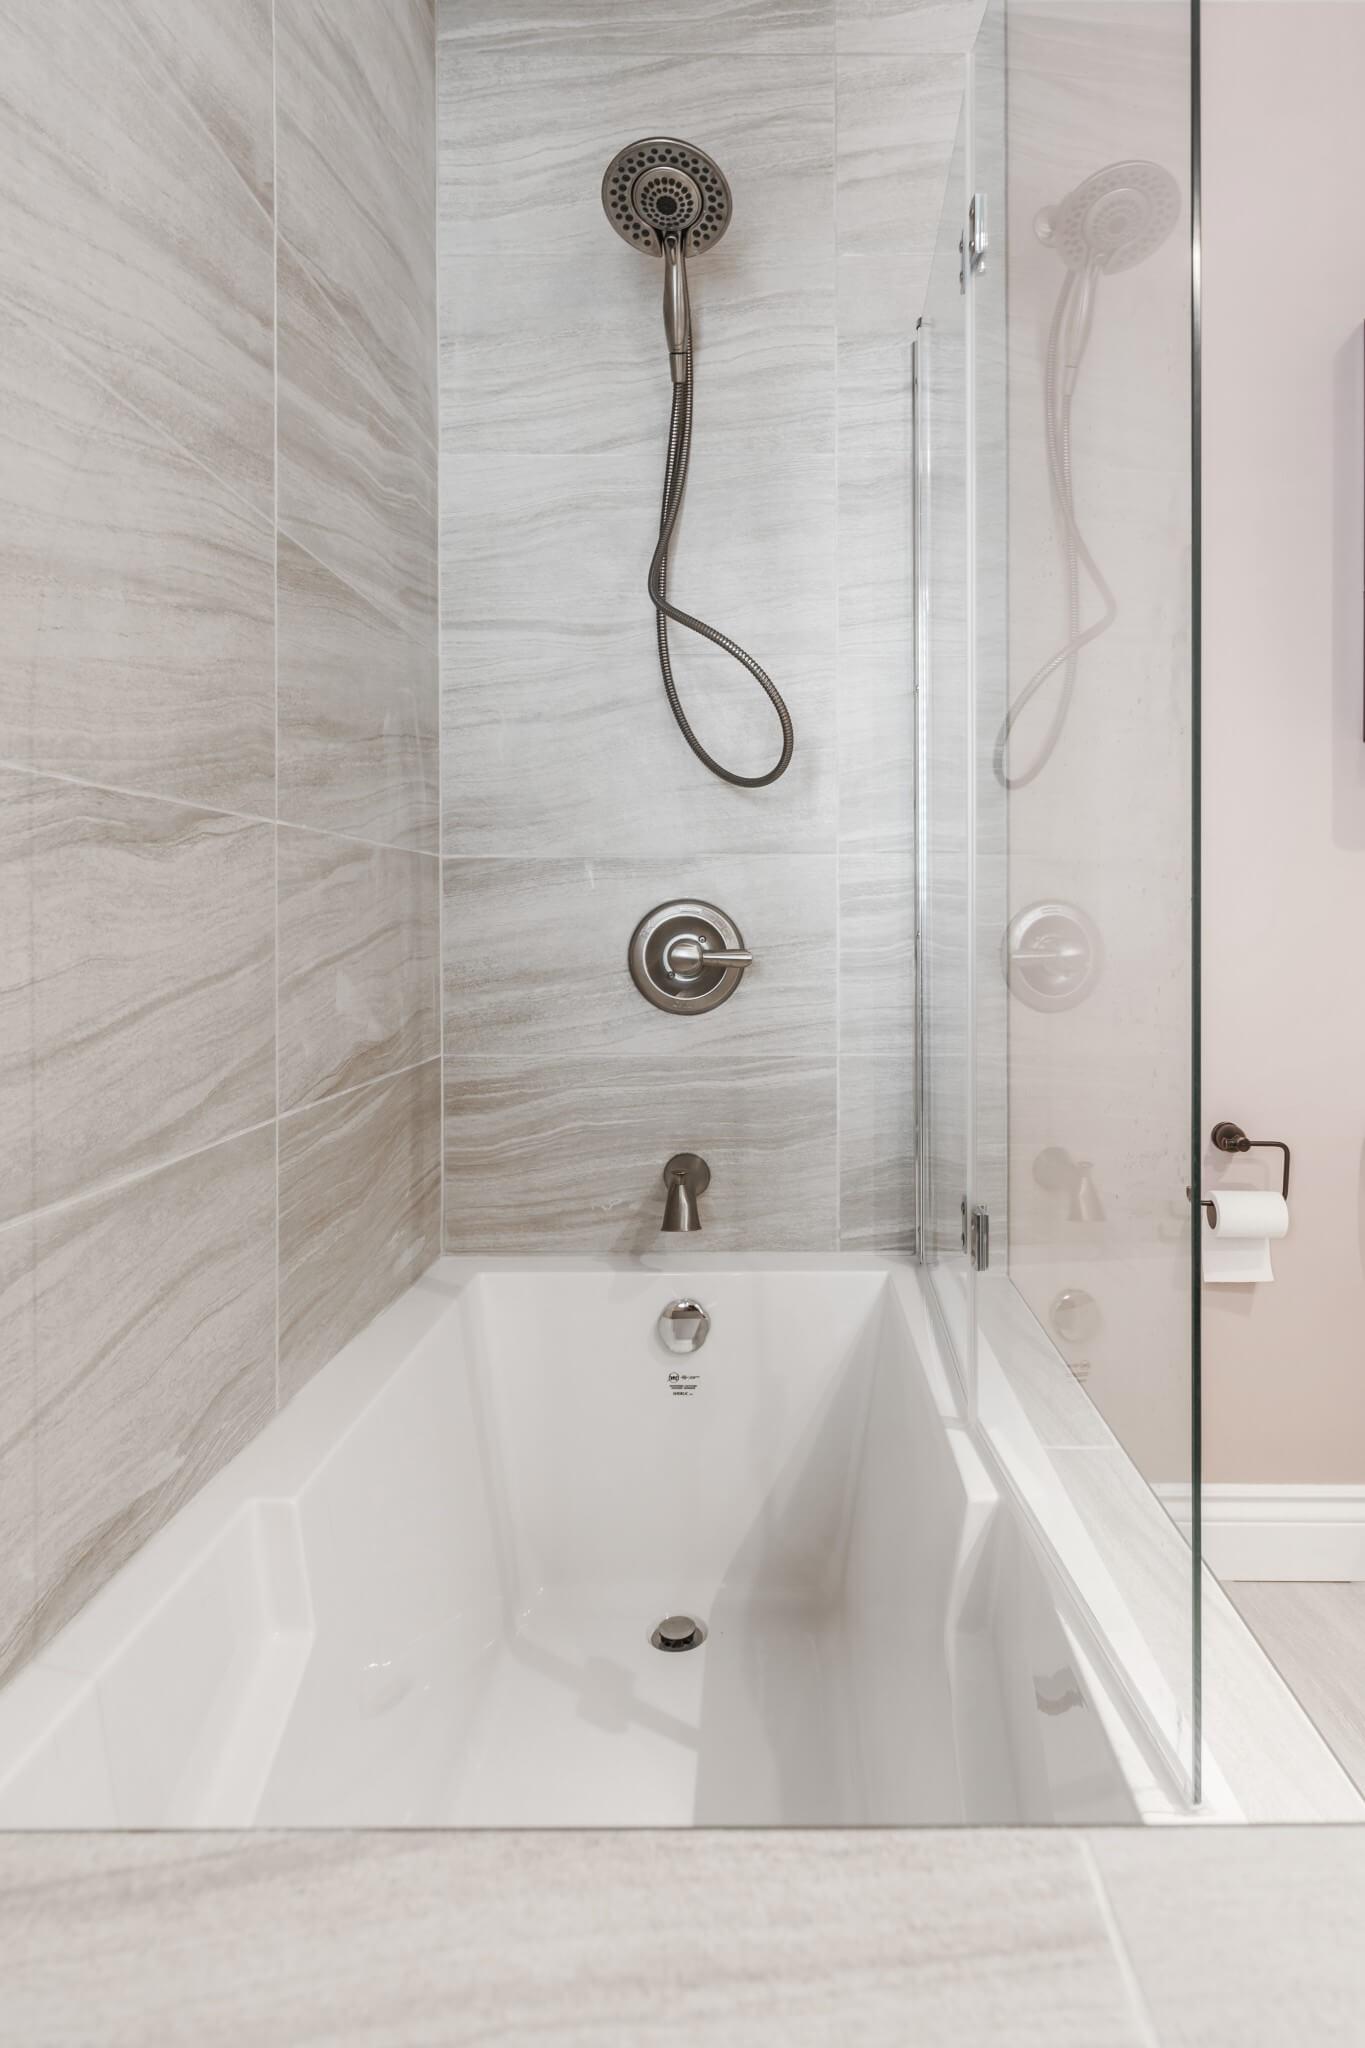 douche de salle de bain classique